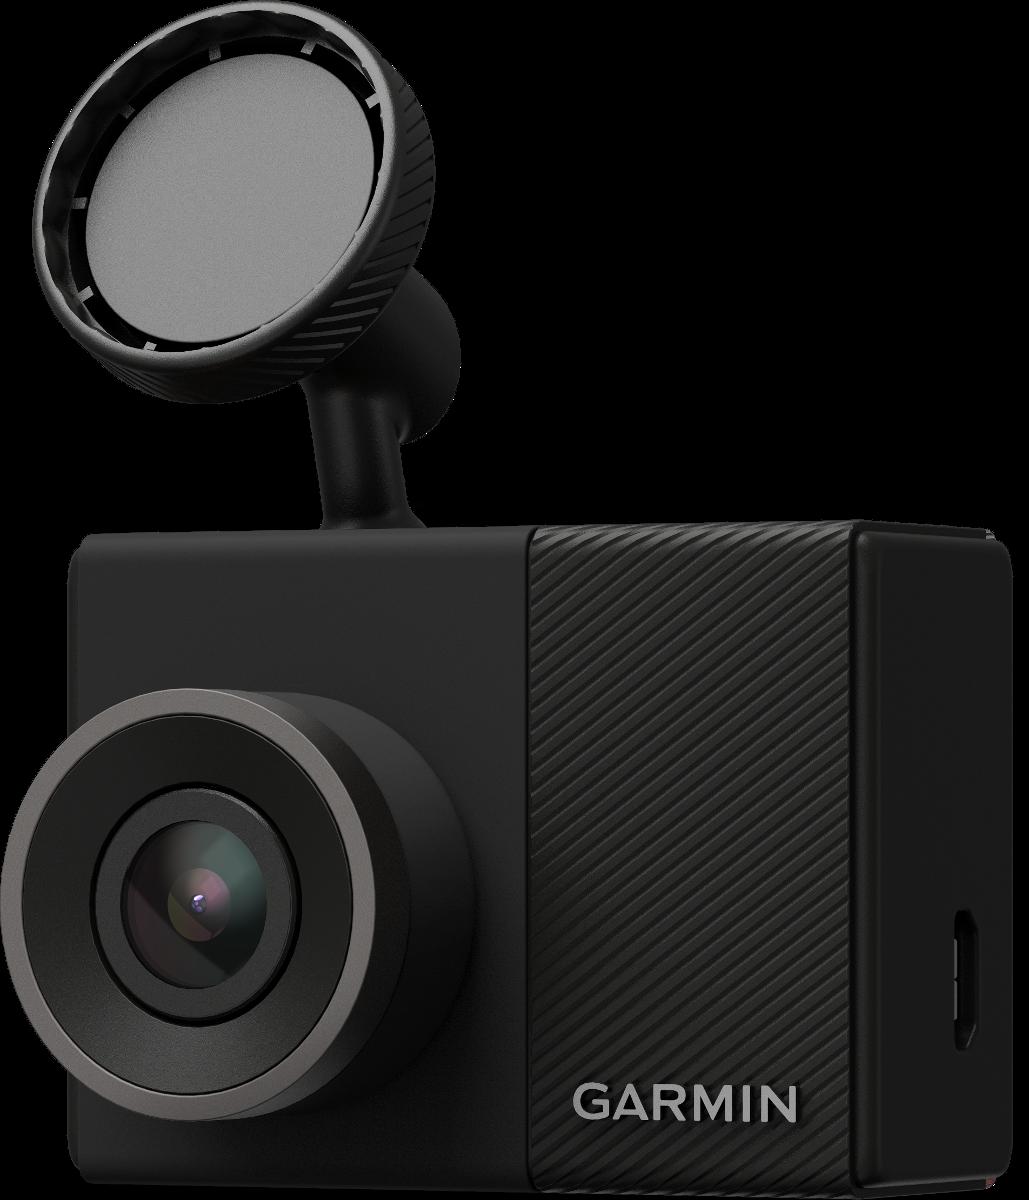 garmin dash cam 45 unfallkamera 2 1 mp schwarz. Black Bedroom Furniture Sets. Home Design Ideas